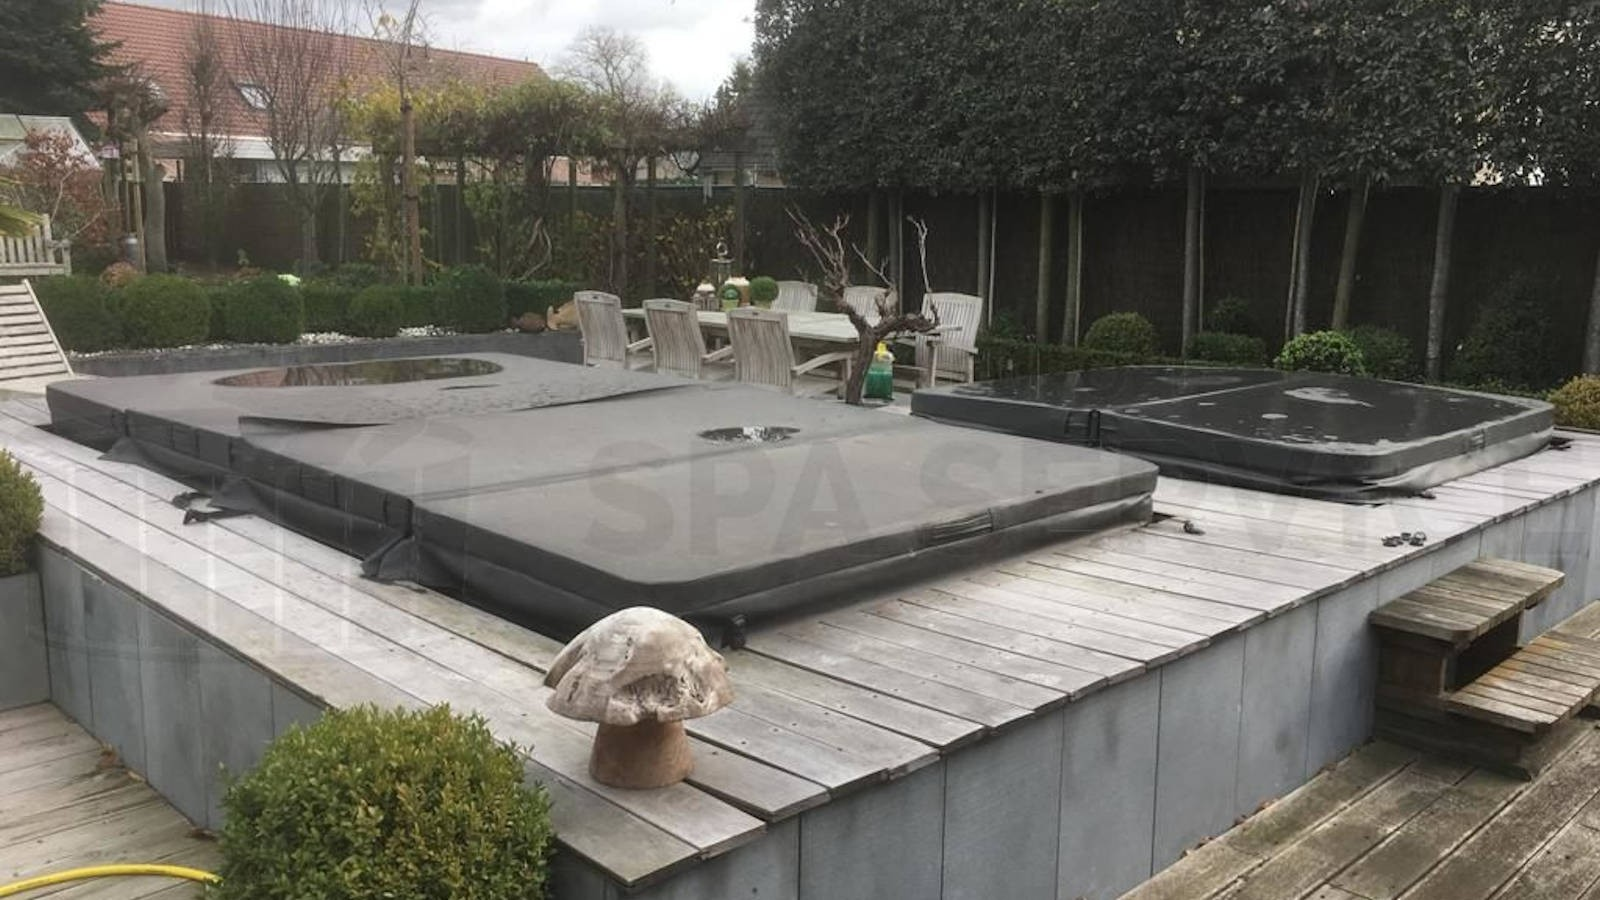 Reparatie lekkage aan een Sunspa zwemspa in Roeselare België